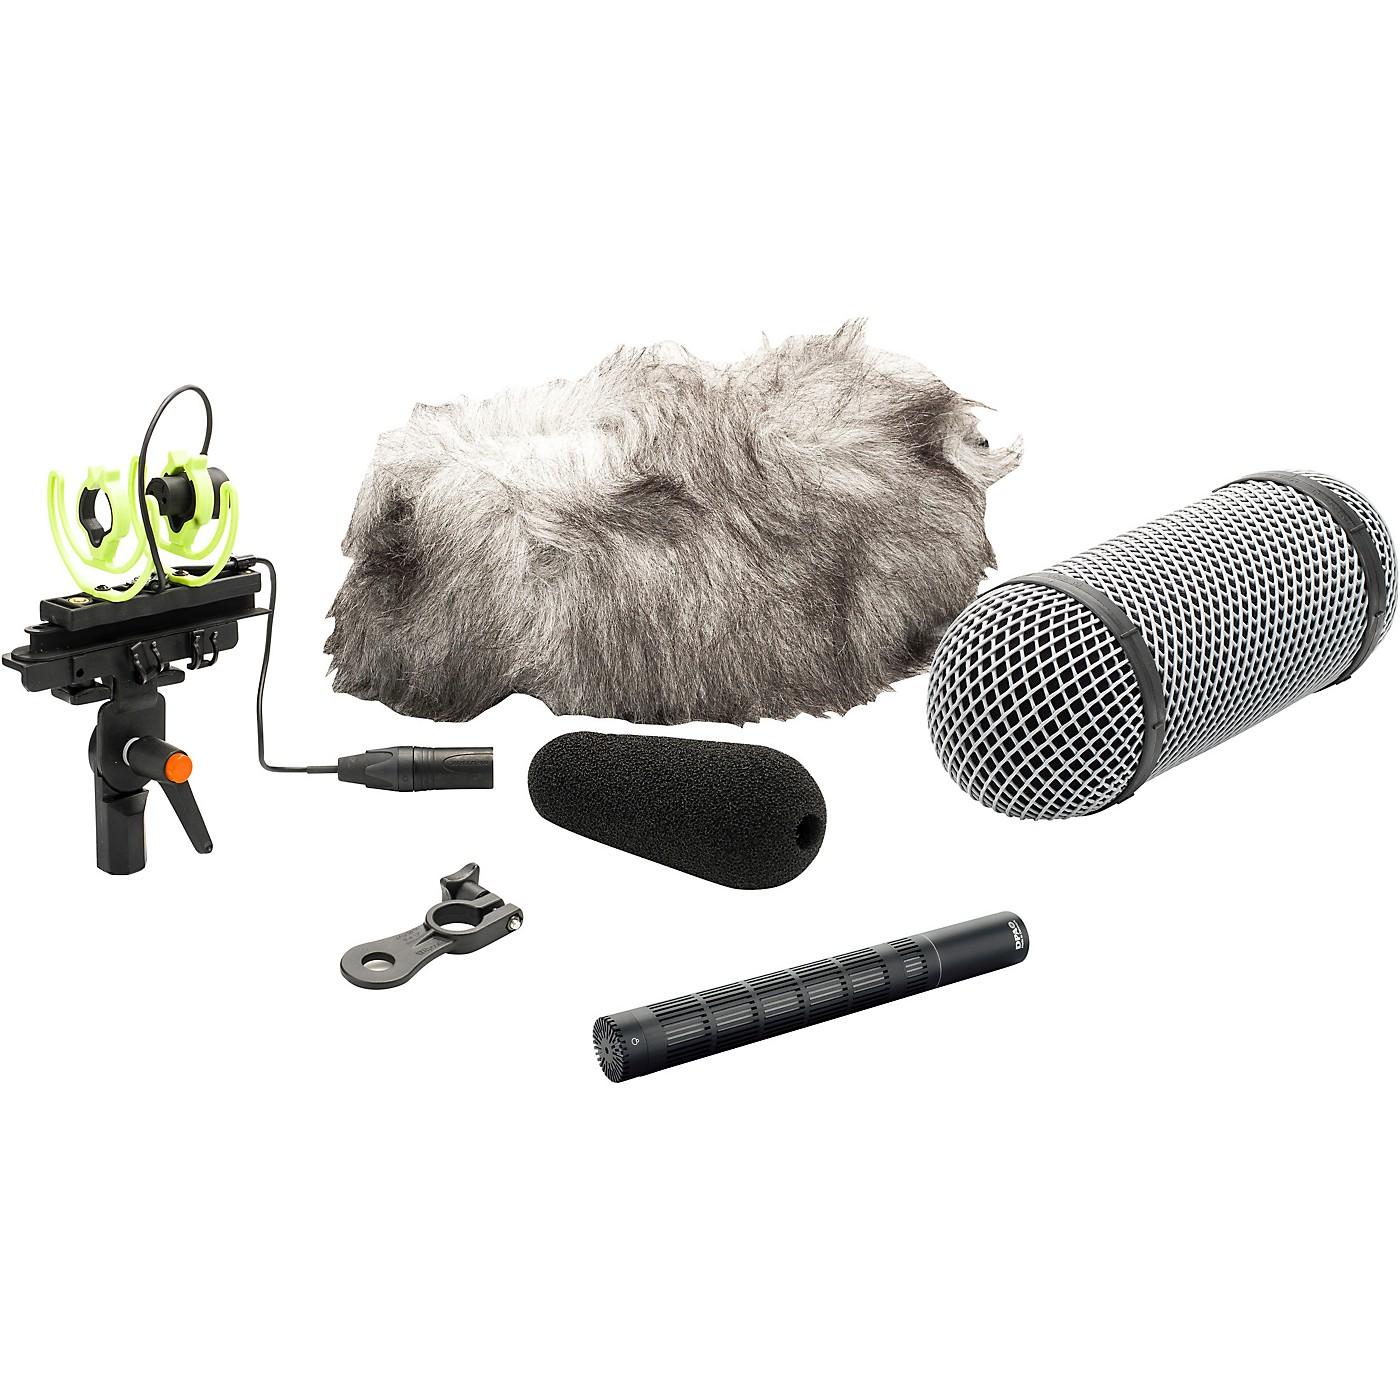 DPA Microphones d:dicate 4017C Compact Shotgun Microphone with Ryocote Windshield thumbnail